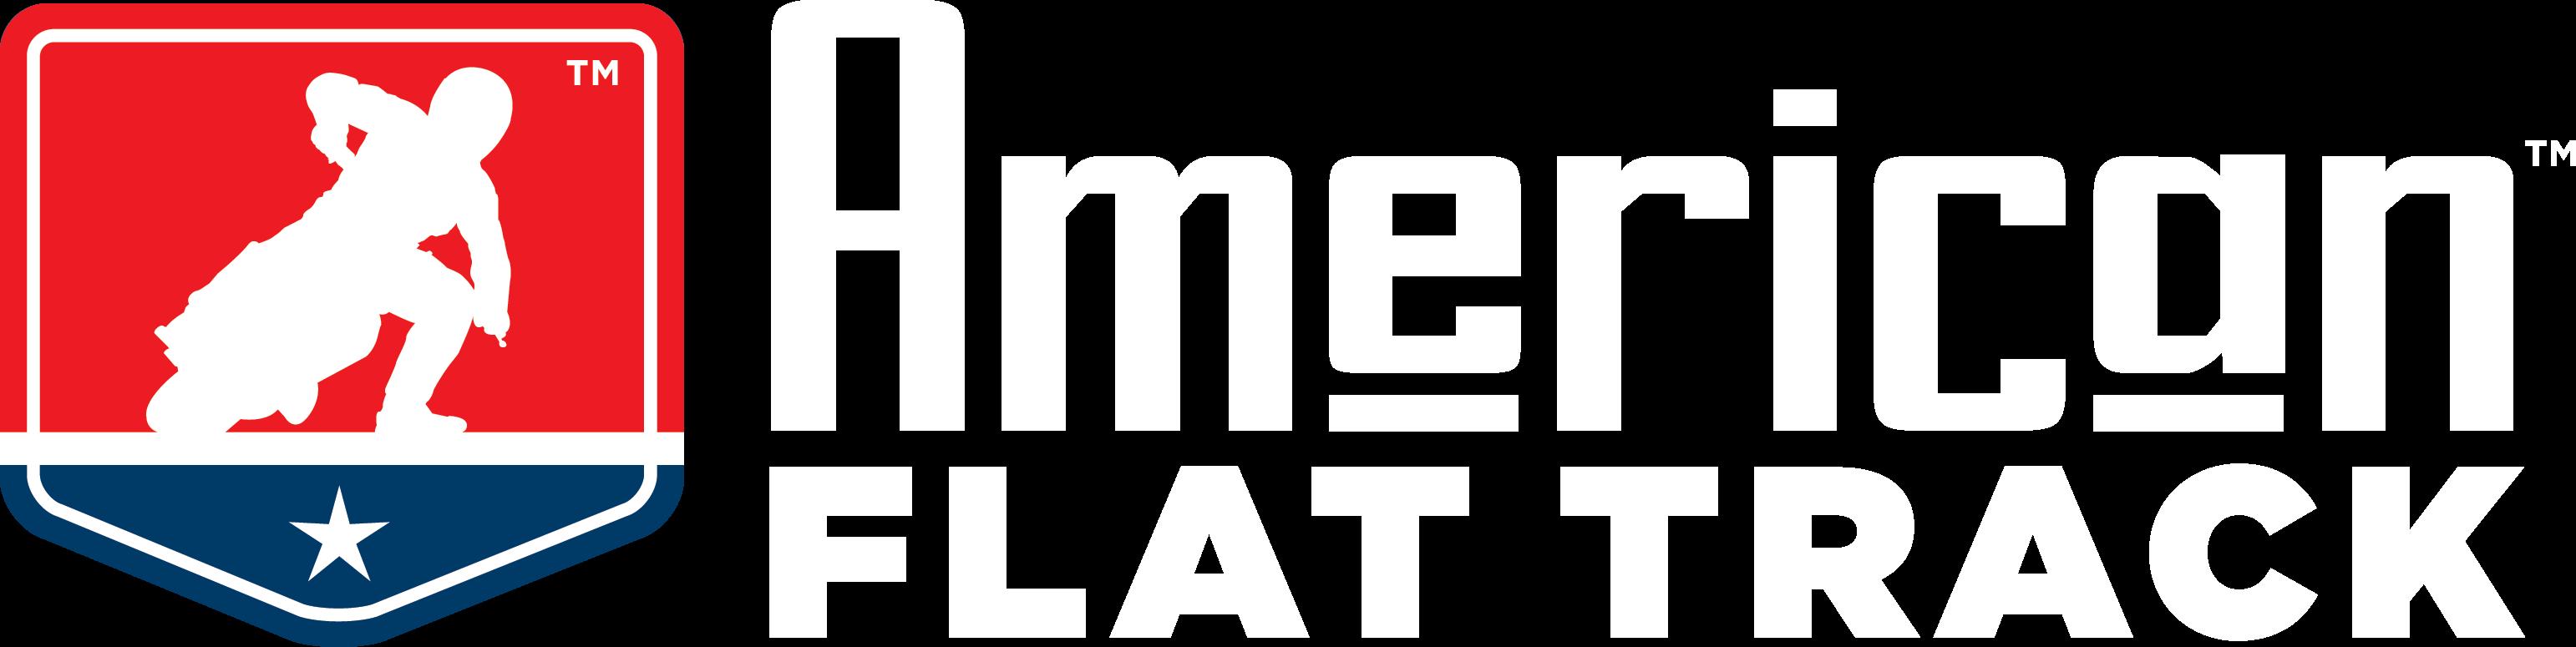 Demon flat track